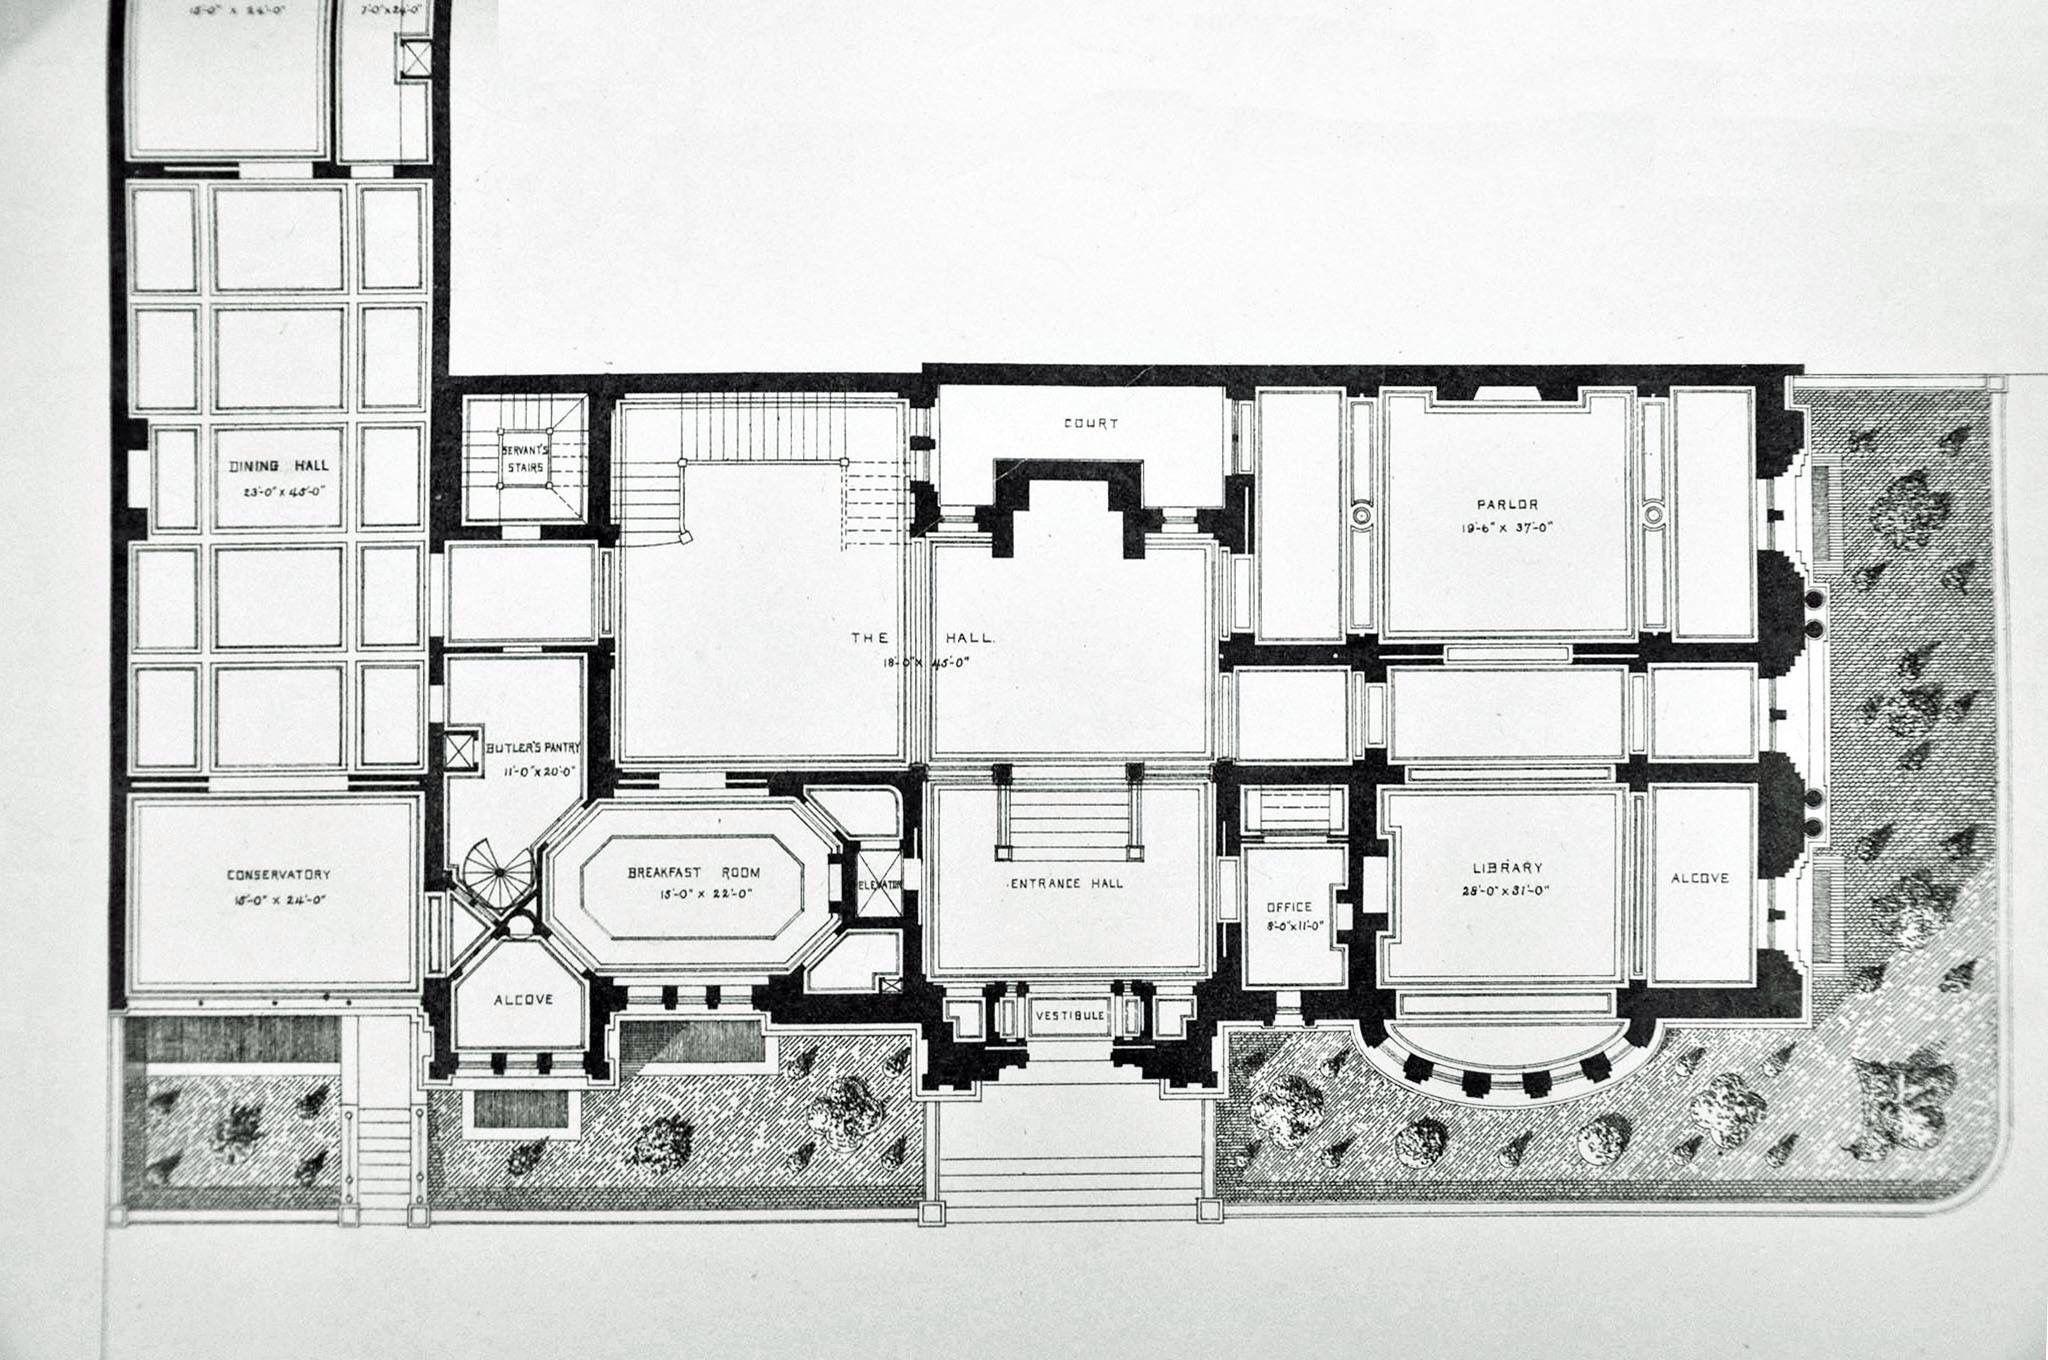 Cornelius Vanderbilt Ii House Original Post Design Prior To The Hunt Renovation Expansion 1st Floor Mansion Plans Mansion Floor Plan Vintage House Plans